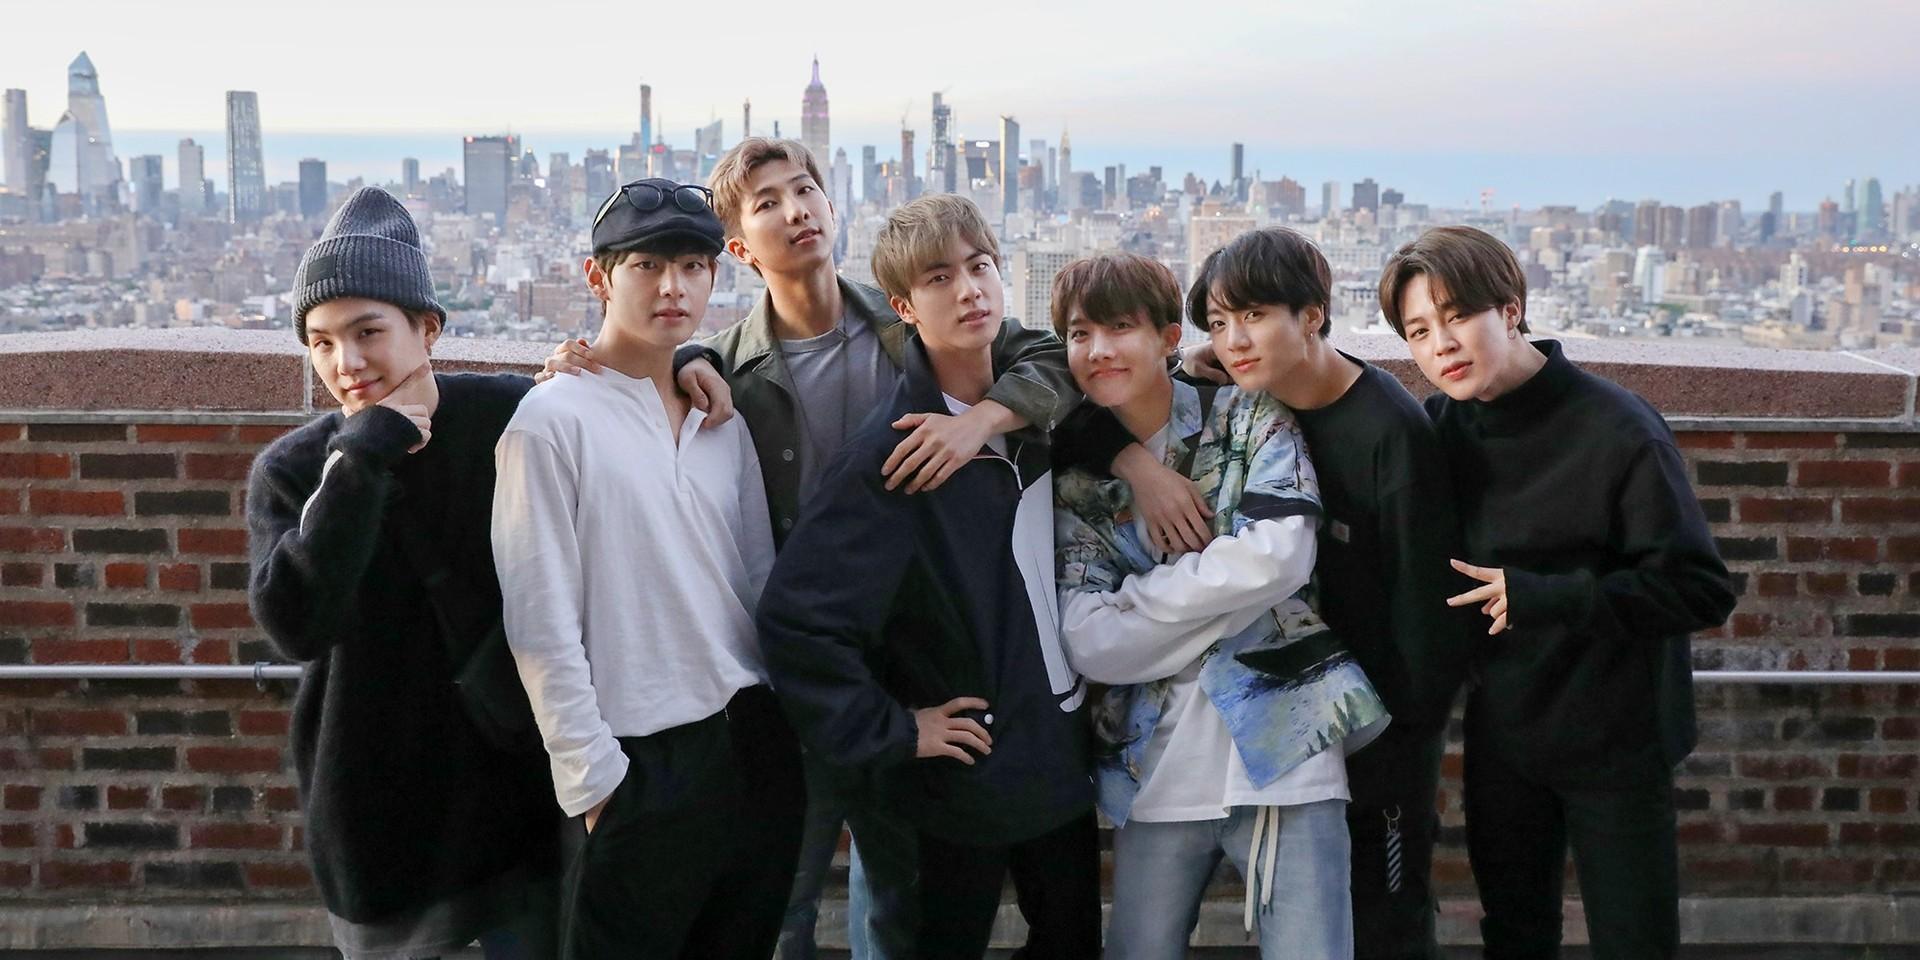 Big Hit unveils 2020 report, reveals future plans: new BTS album, BTS concert, TXT comeback, new idol groups, and more